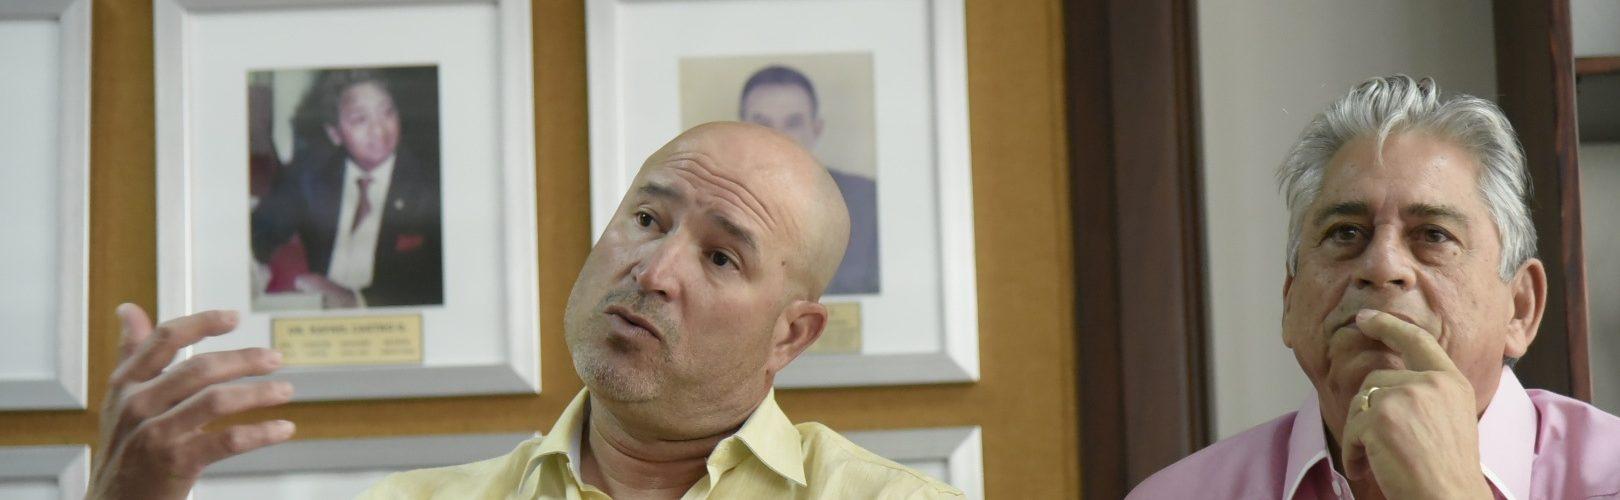 Manny Acta confía mánager lleve AC a triunfo